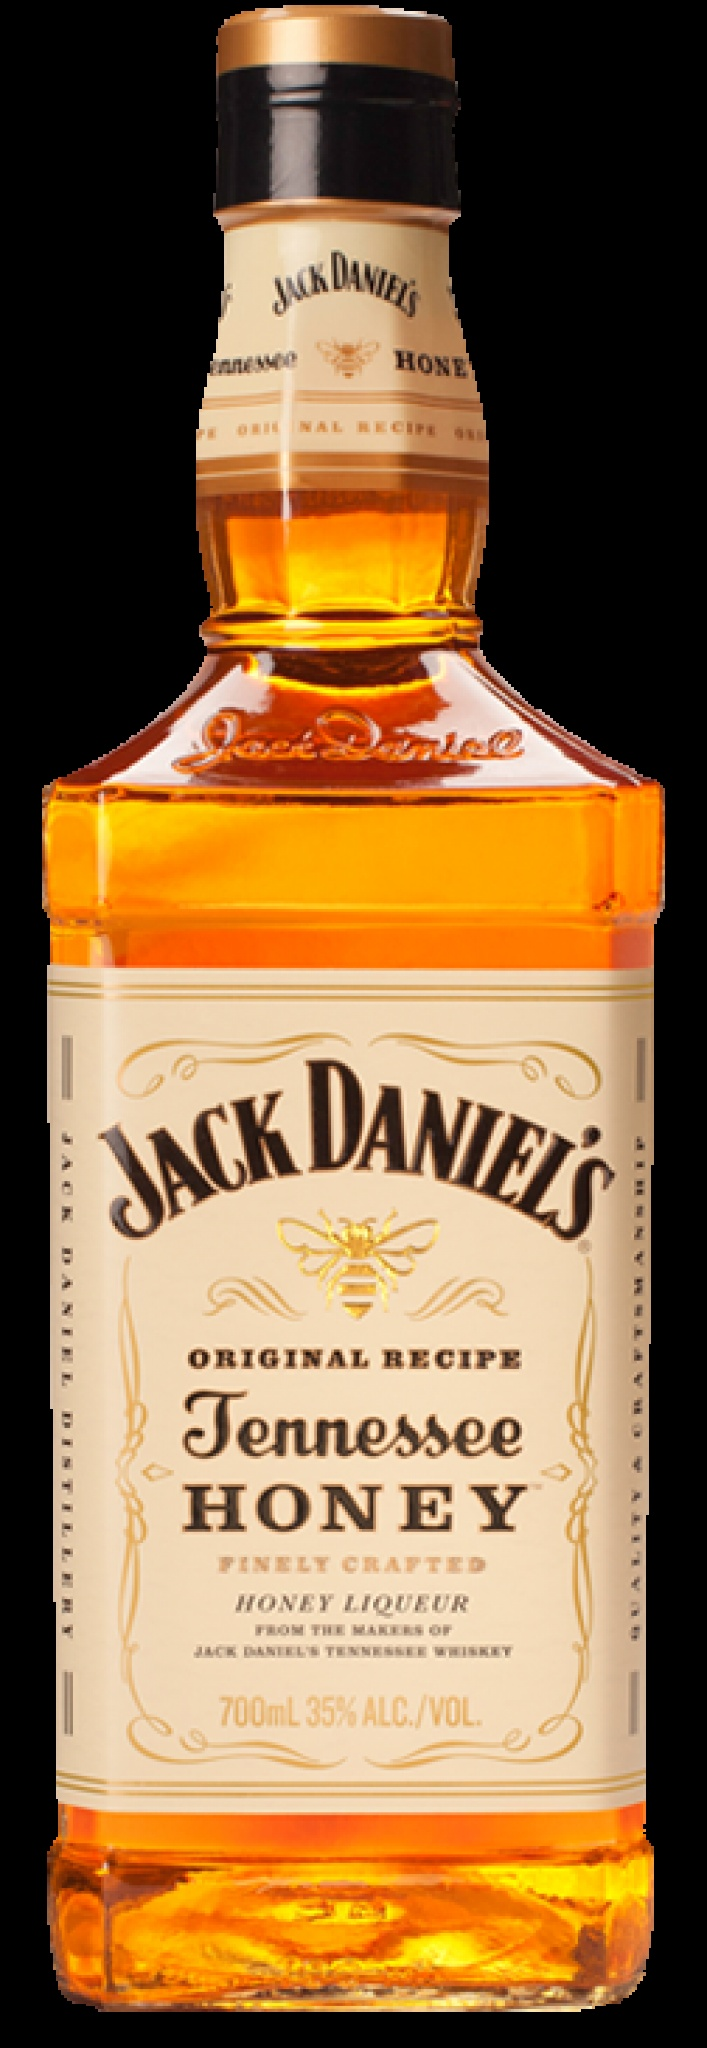 Jack Daniels Tennessee Honey Whiskey